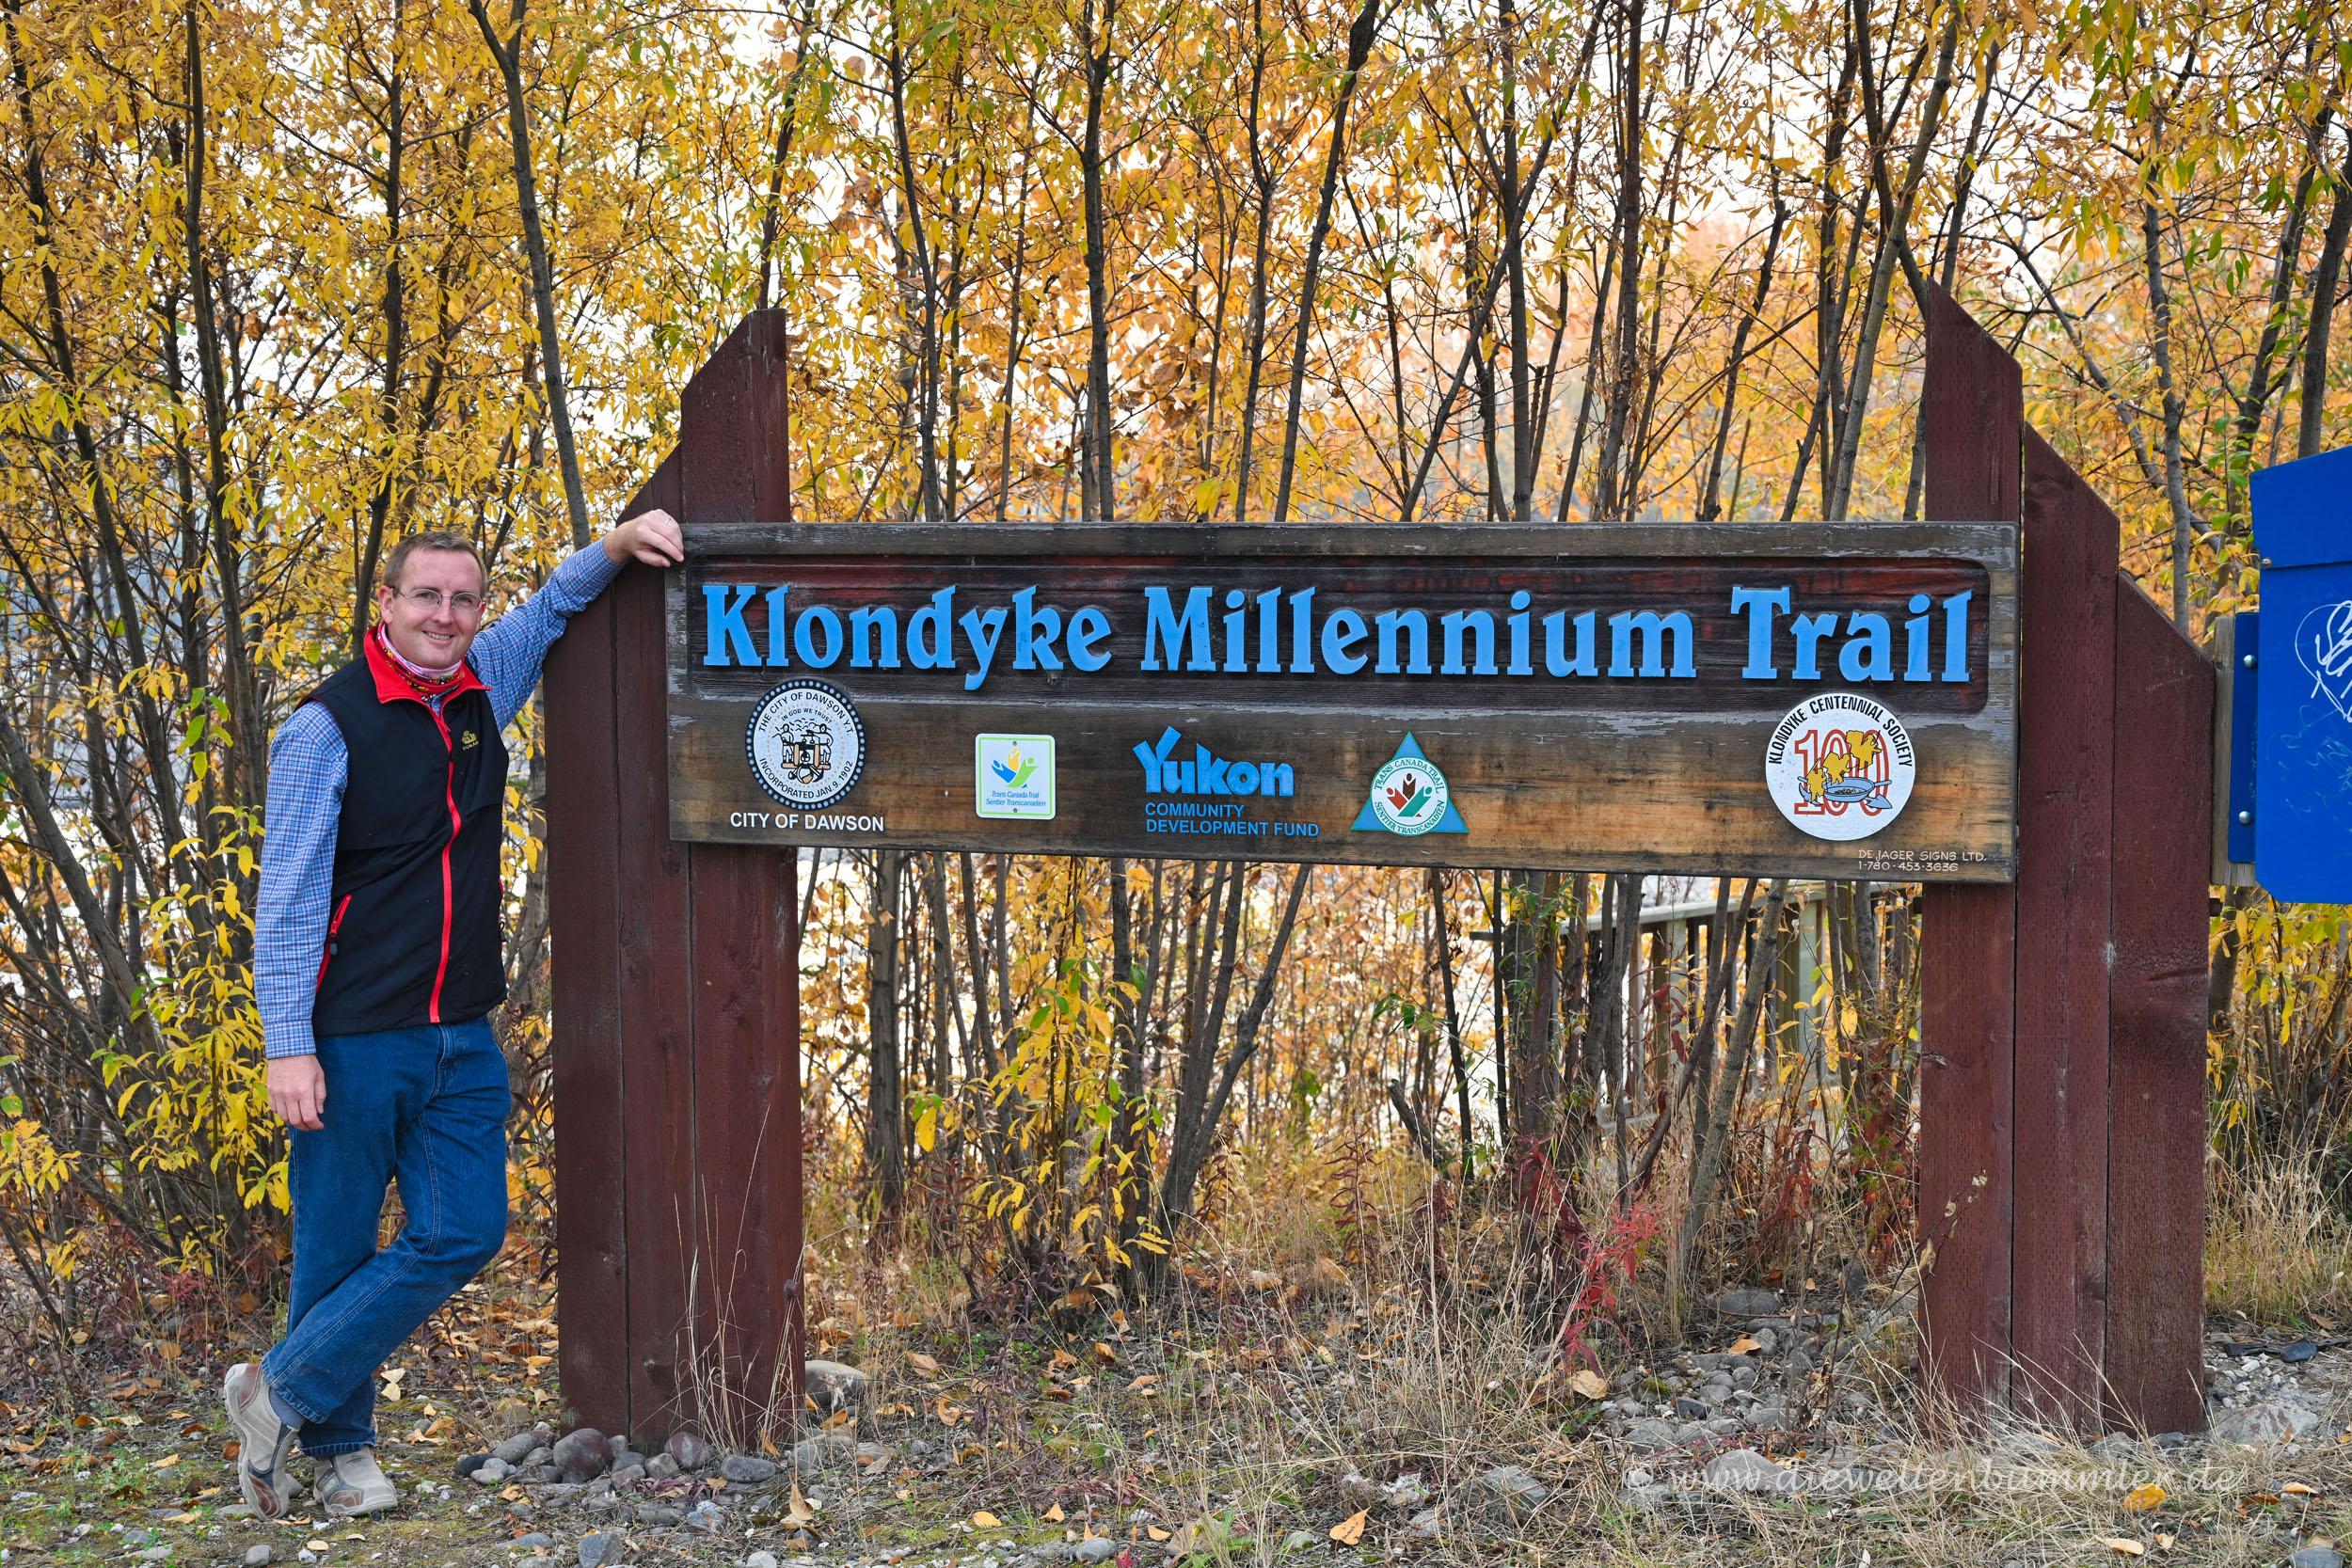 Klondyke Millenium Trail